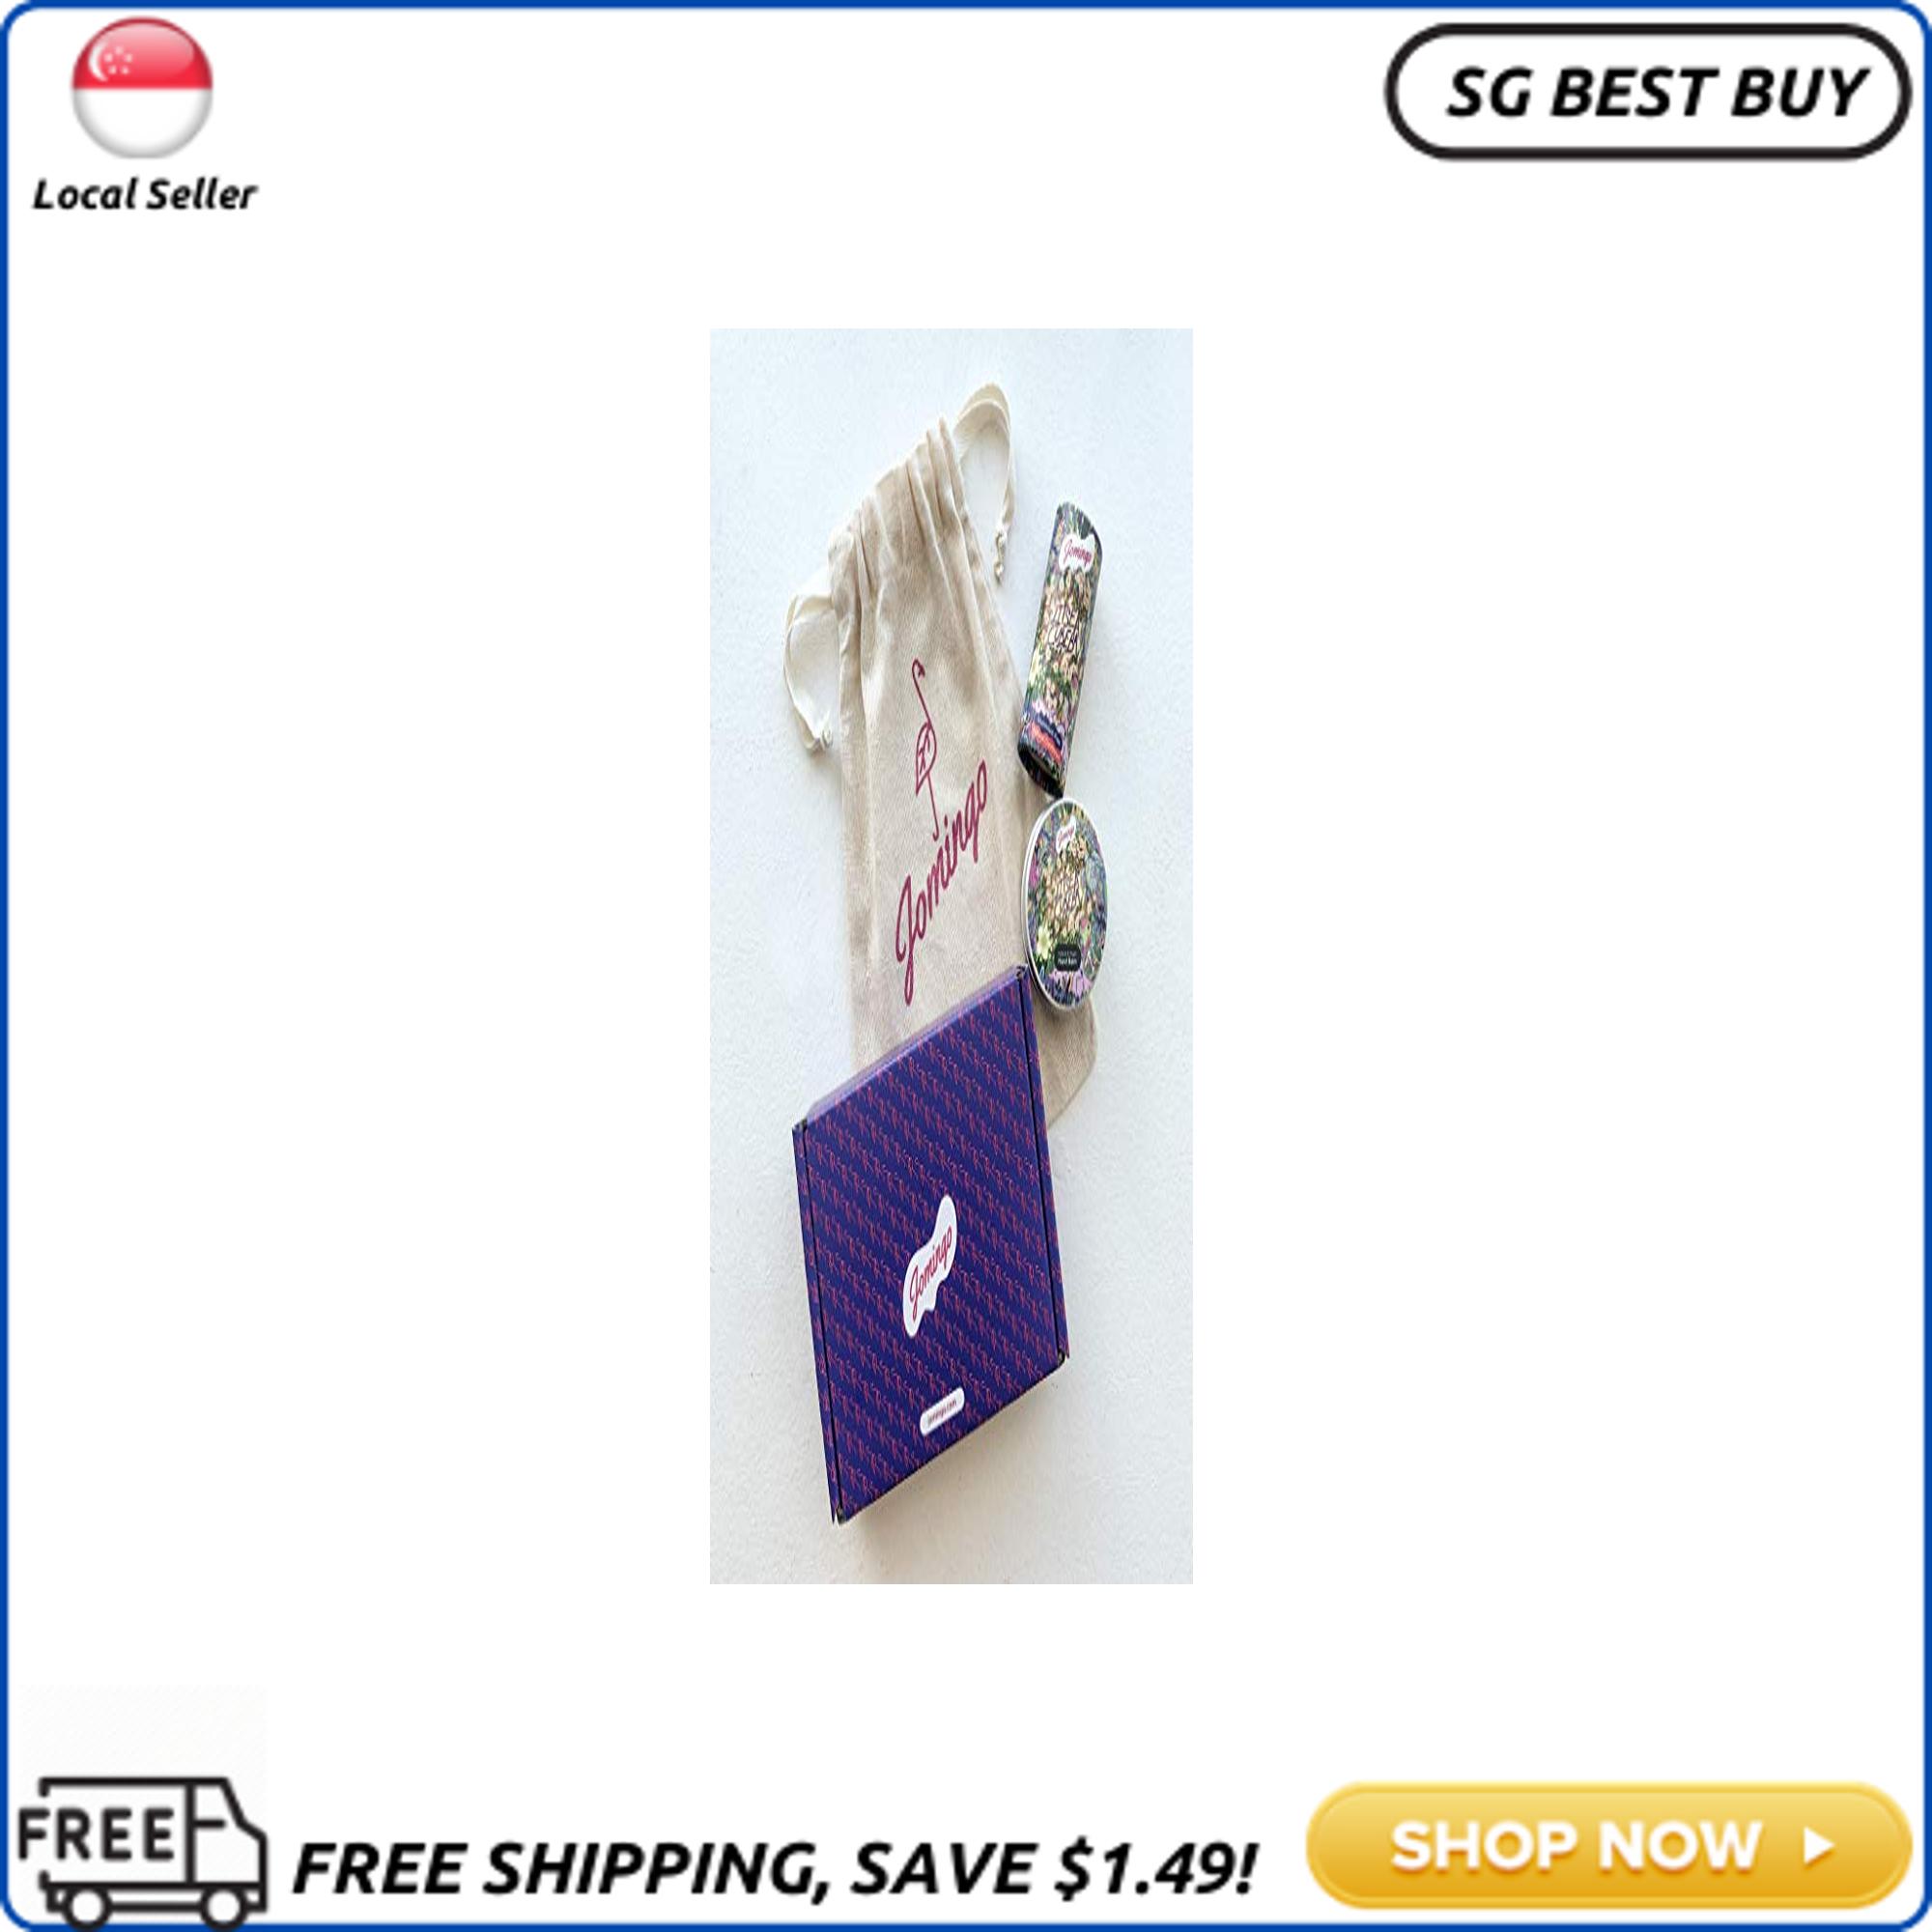 Buy [SG SELLER]Jomingo Value Gift Set Hand Balm & Natural Deodorant - Plant Based, Vegan - Eco Friendly Packaging - Effective and Long Lasting For Adolescents, Women & Men  Litsea Cubeba Singapore